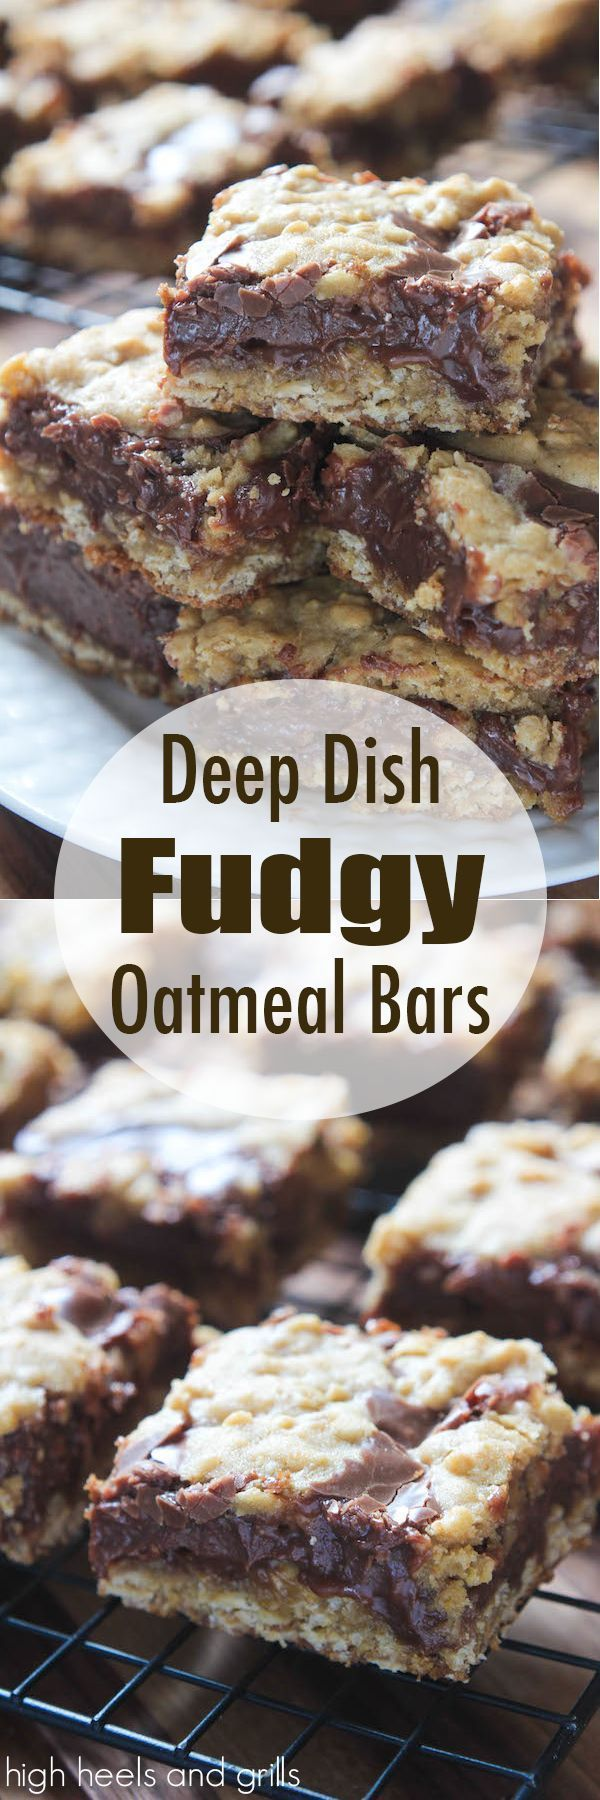 Dish Fudgy Oatmeal Bars